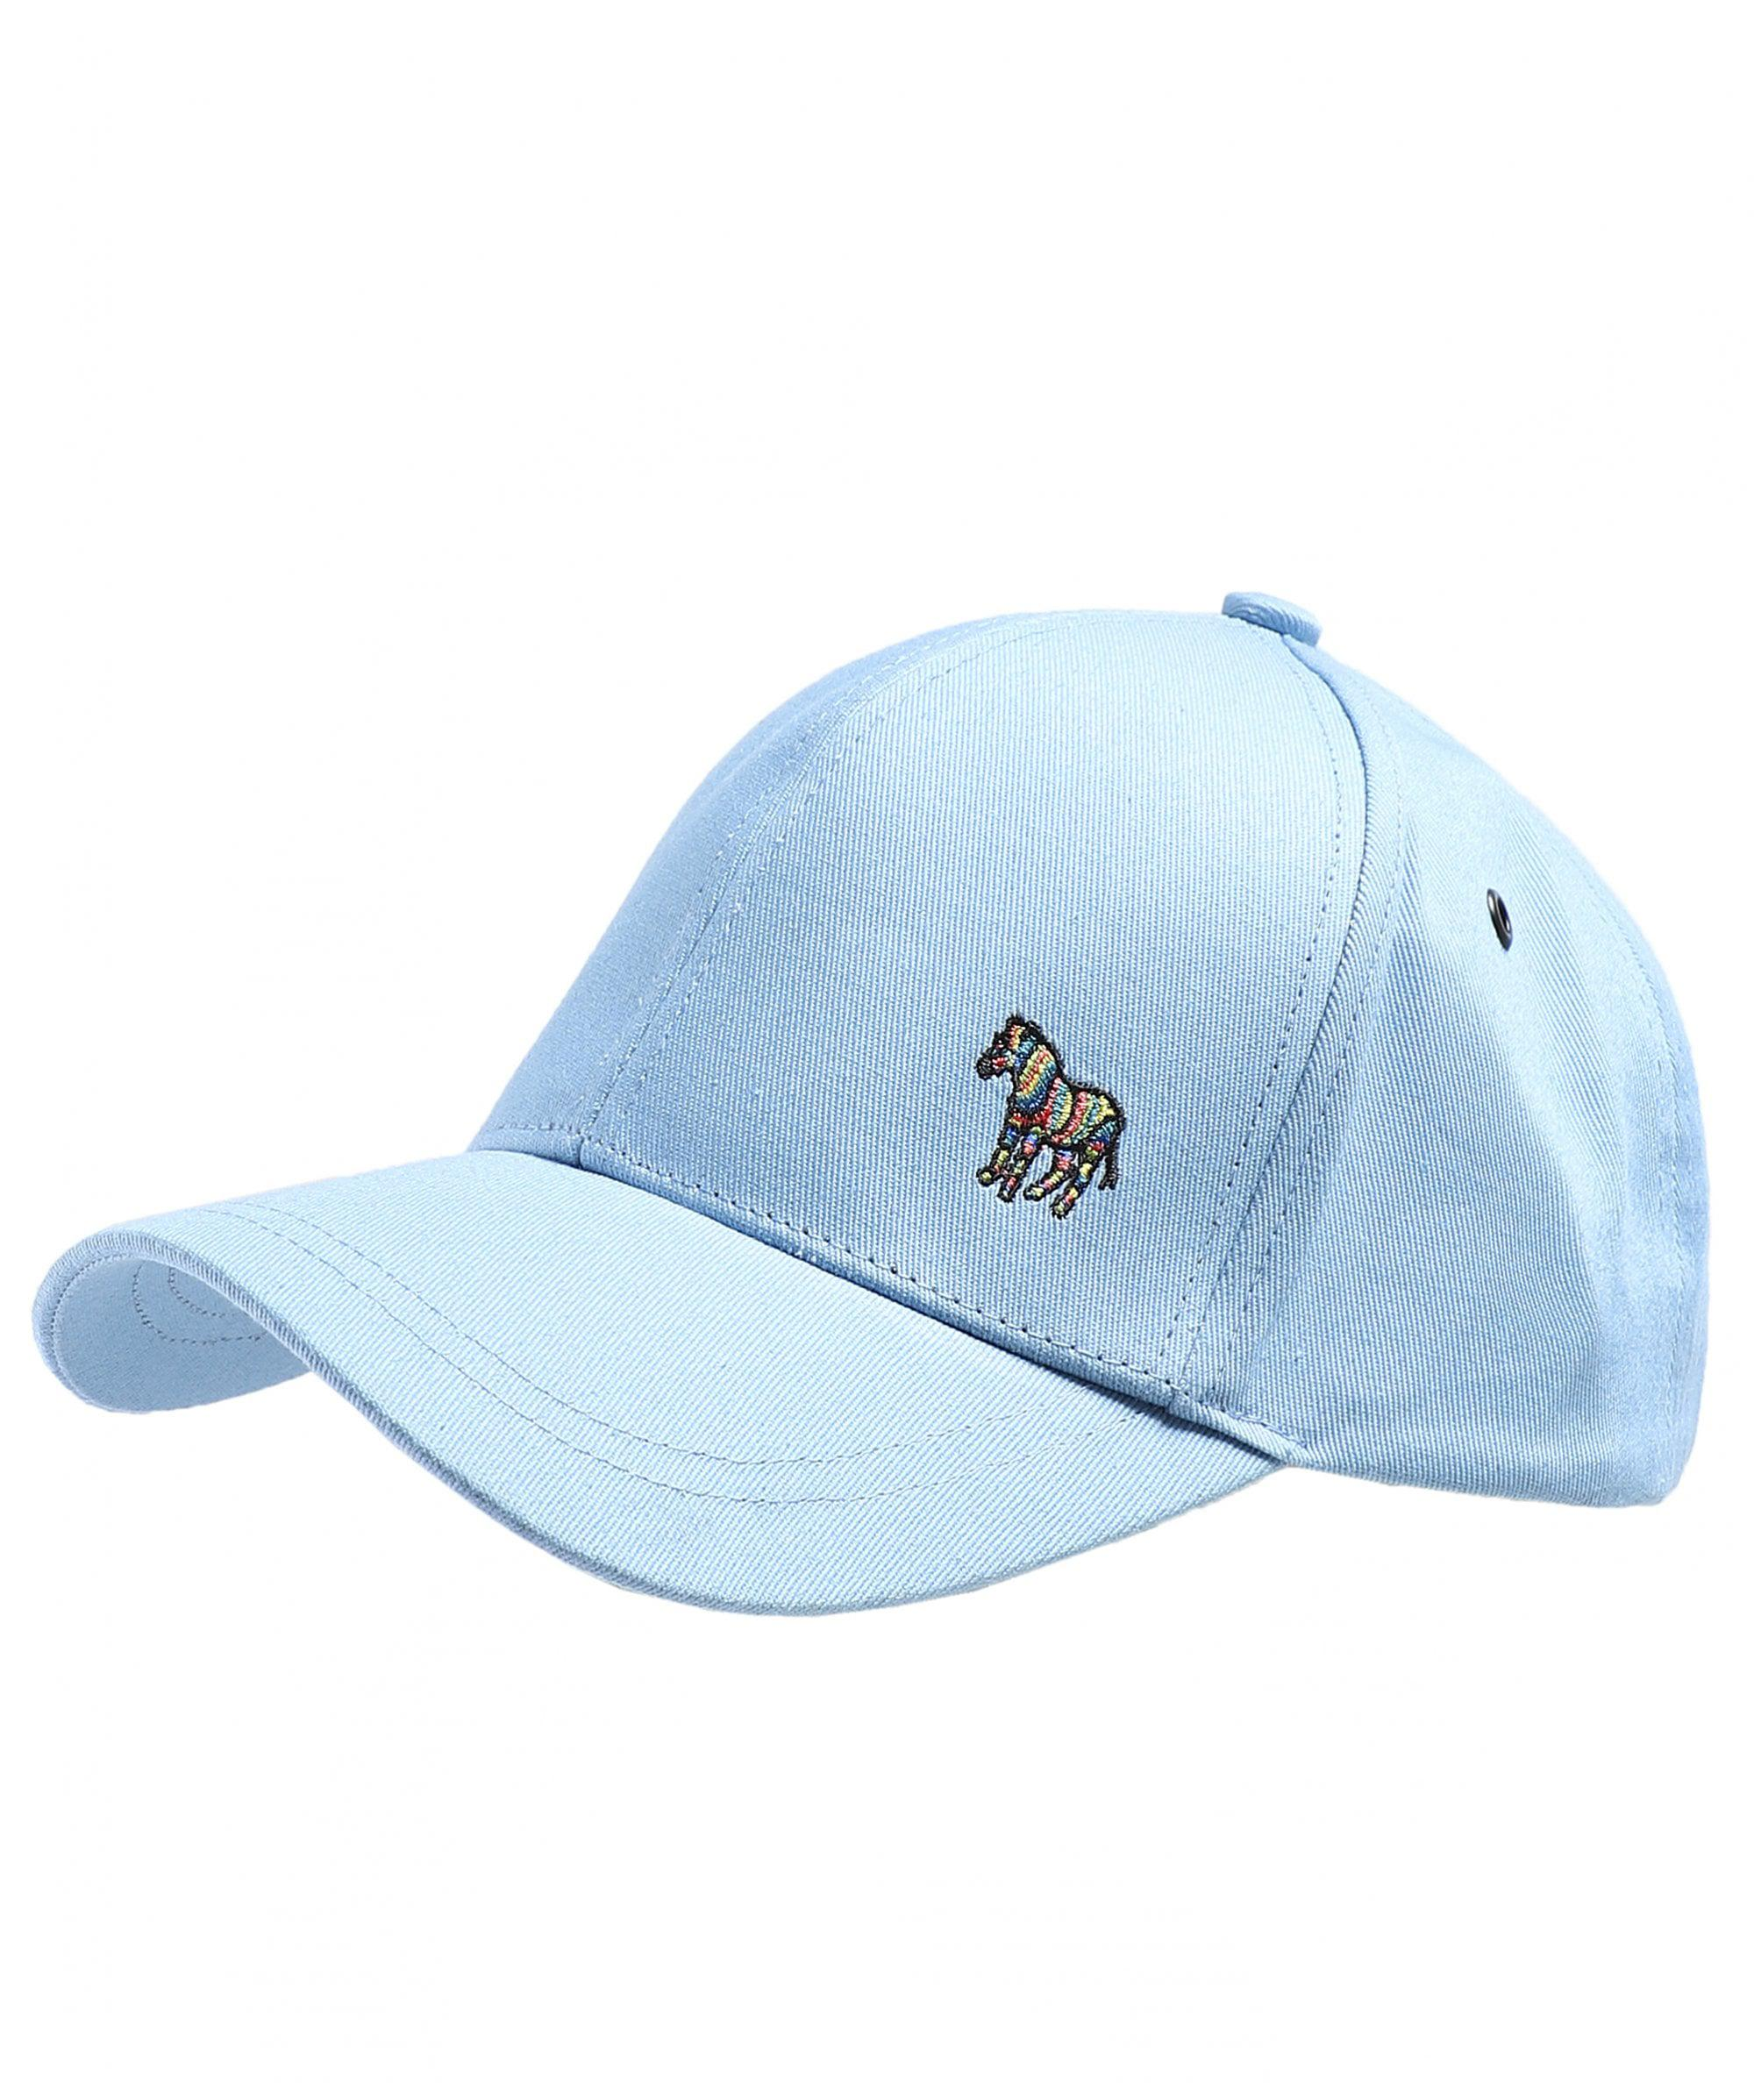 d7457774cef Ps By Paul Smith Cotton Zebra Logo Baseball Cap in Blue for Men - Lyst